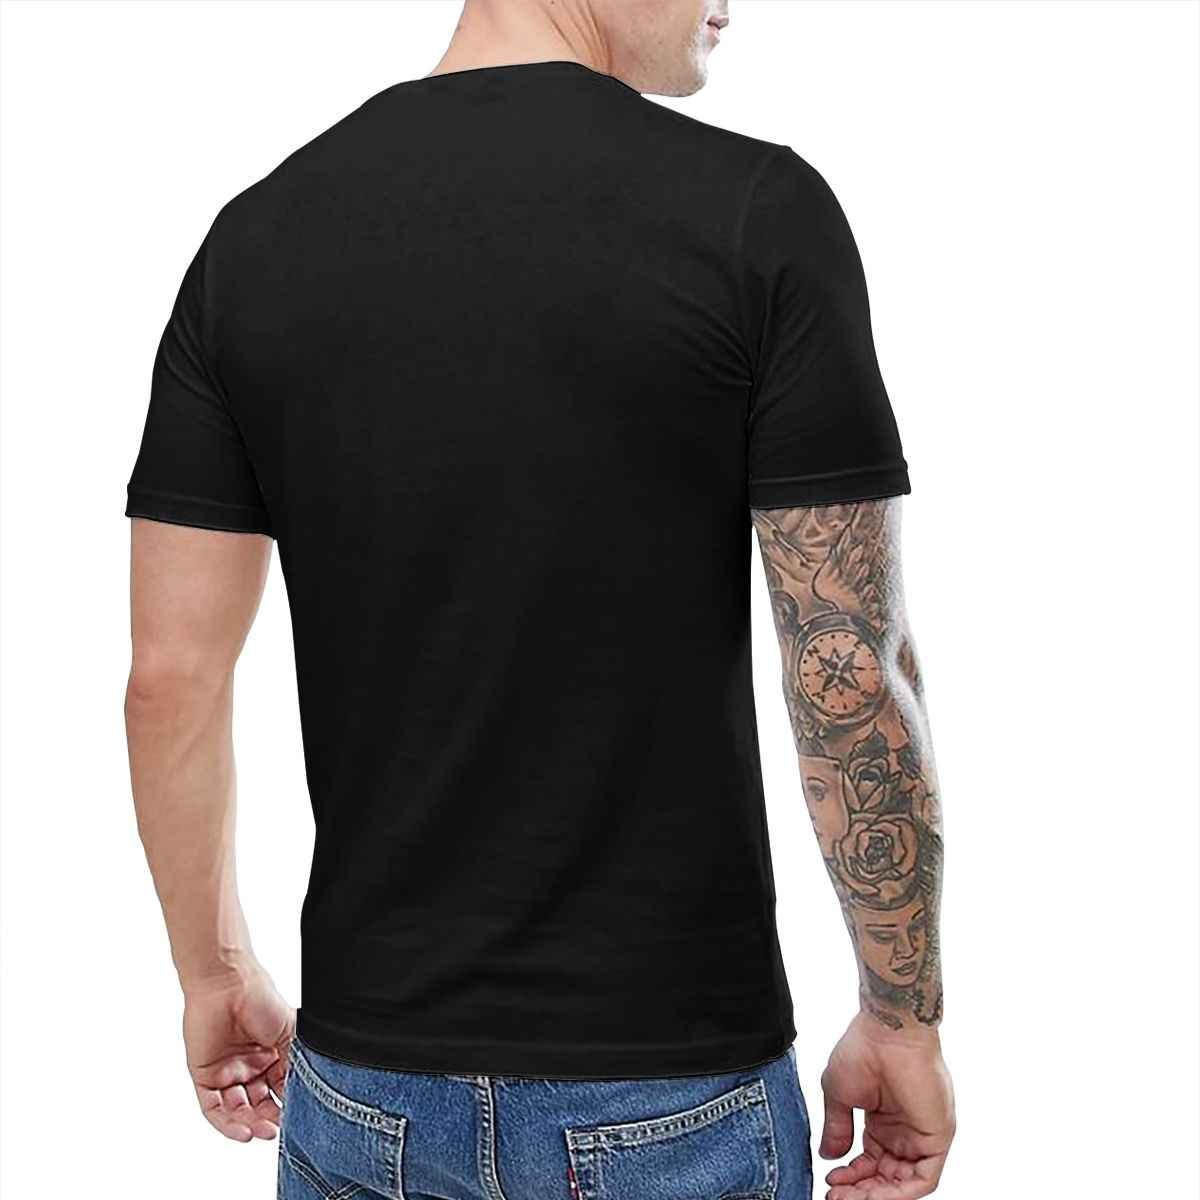 Erkek tişörtü Nick Nate Diaz en Stockton tokat Diaz kardeşler Mma Ufc  Fighter T Shirt| | - AliExpress